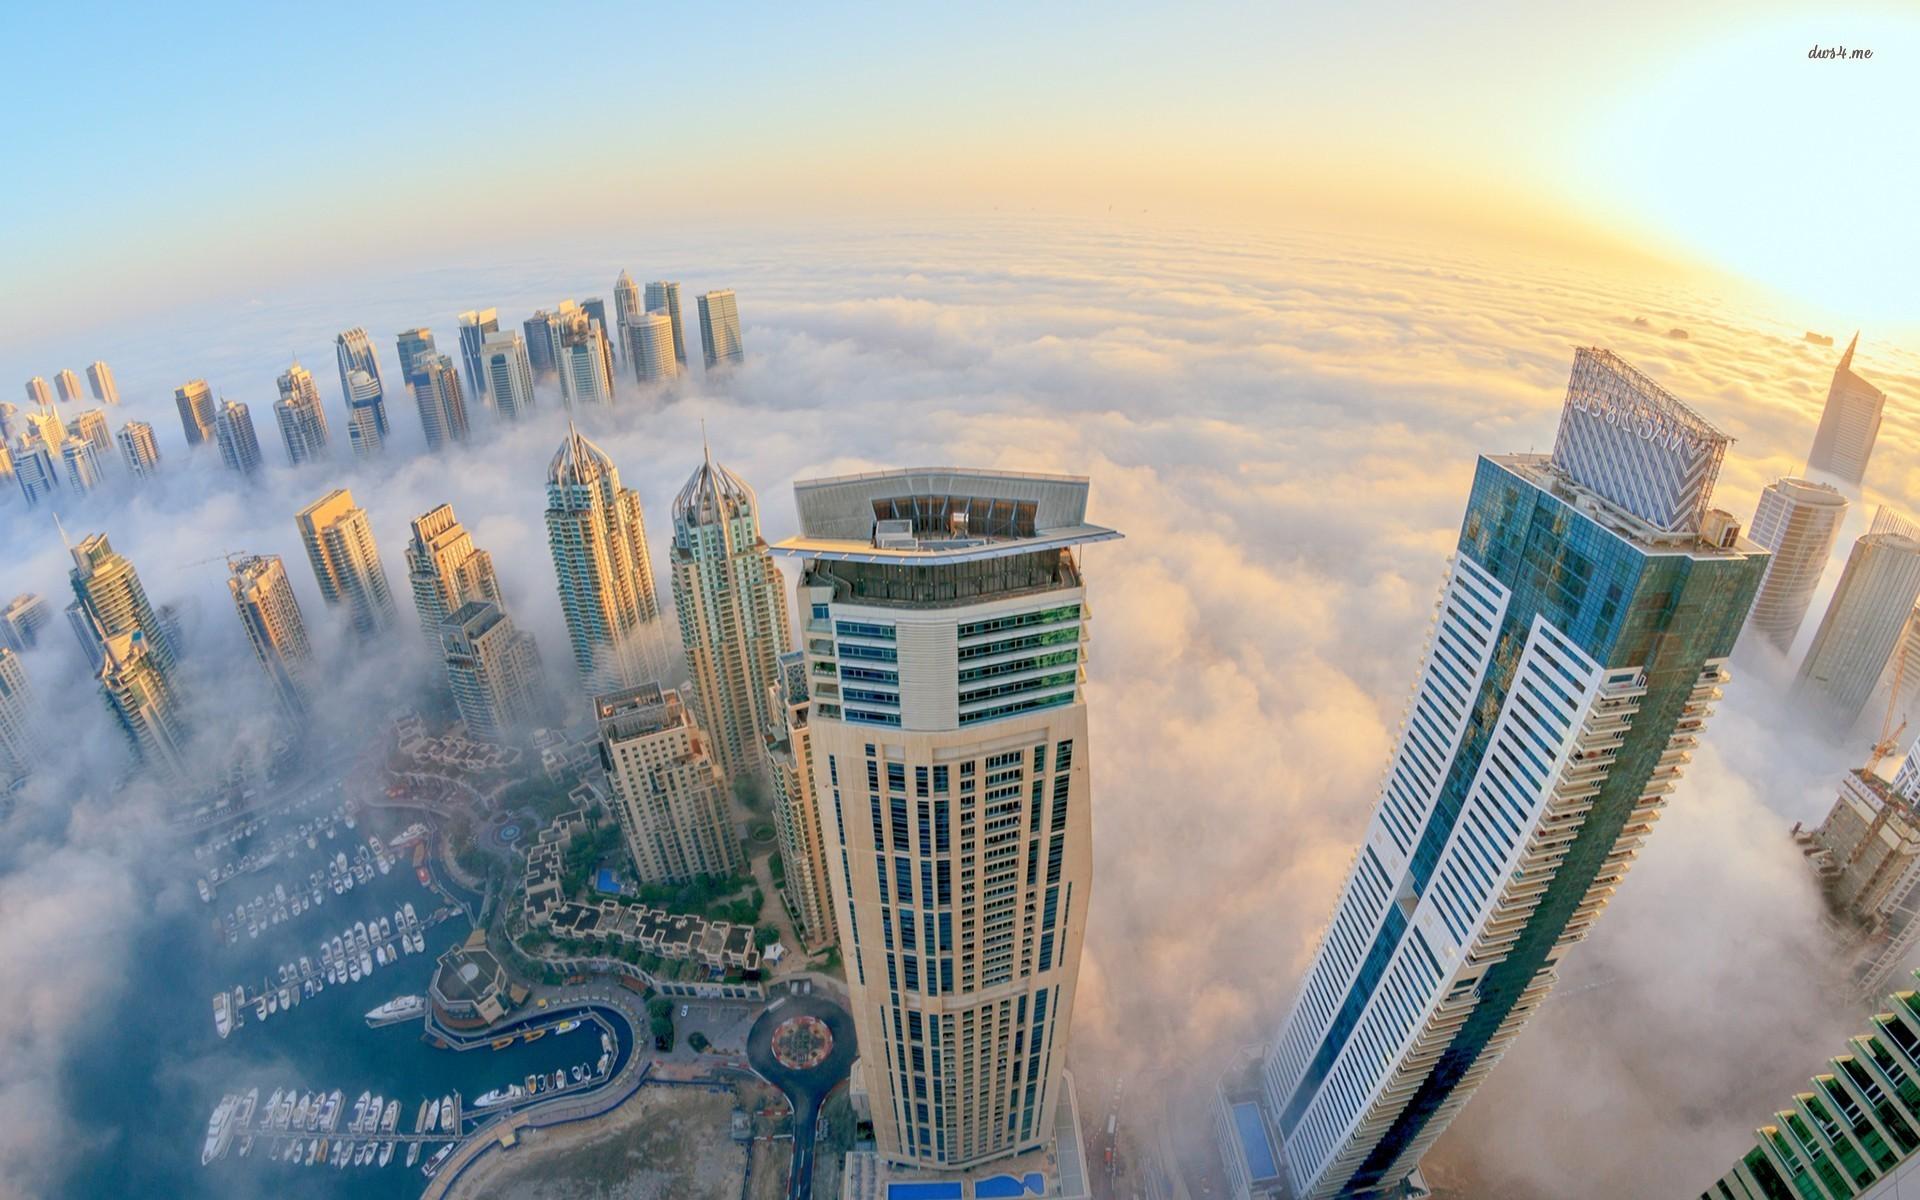 United Arab Emirates Skyscrapers Dubai Night Cities wallpaper 1920x1200